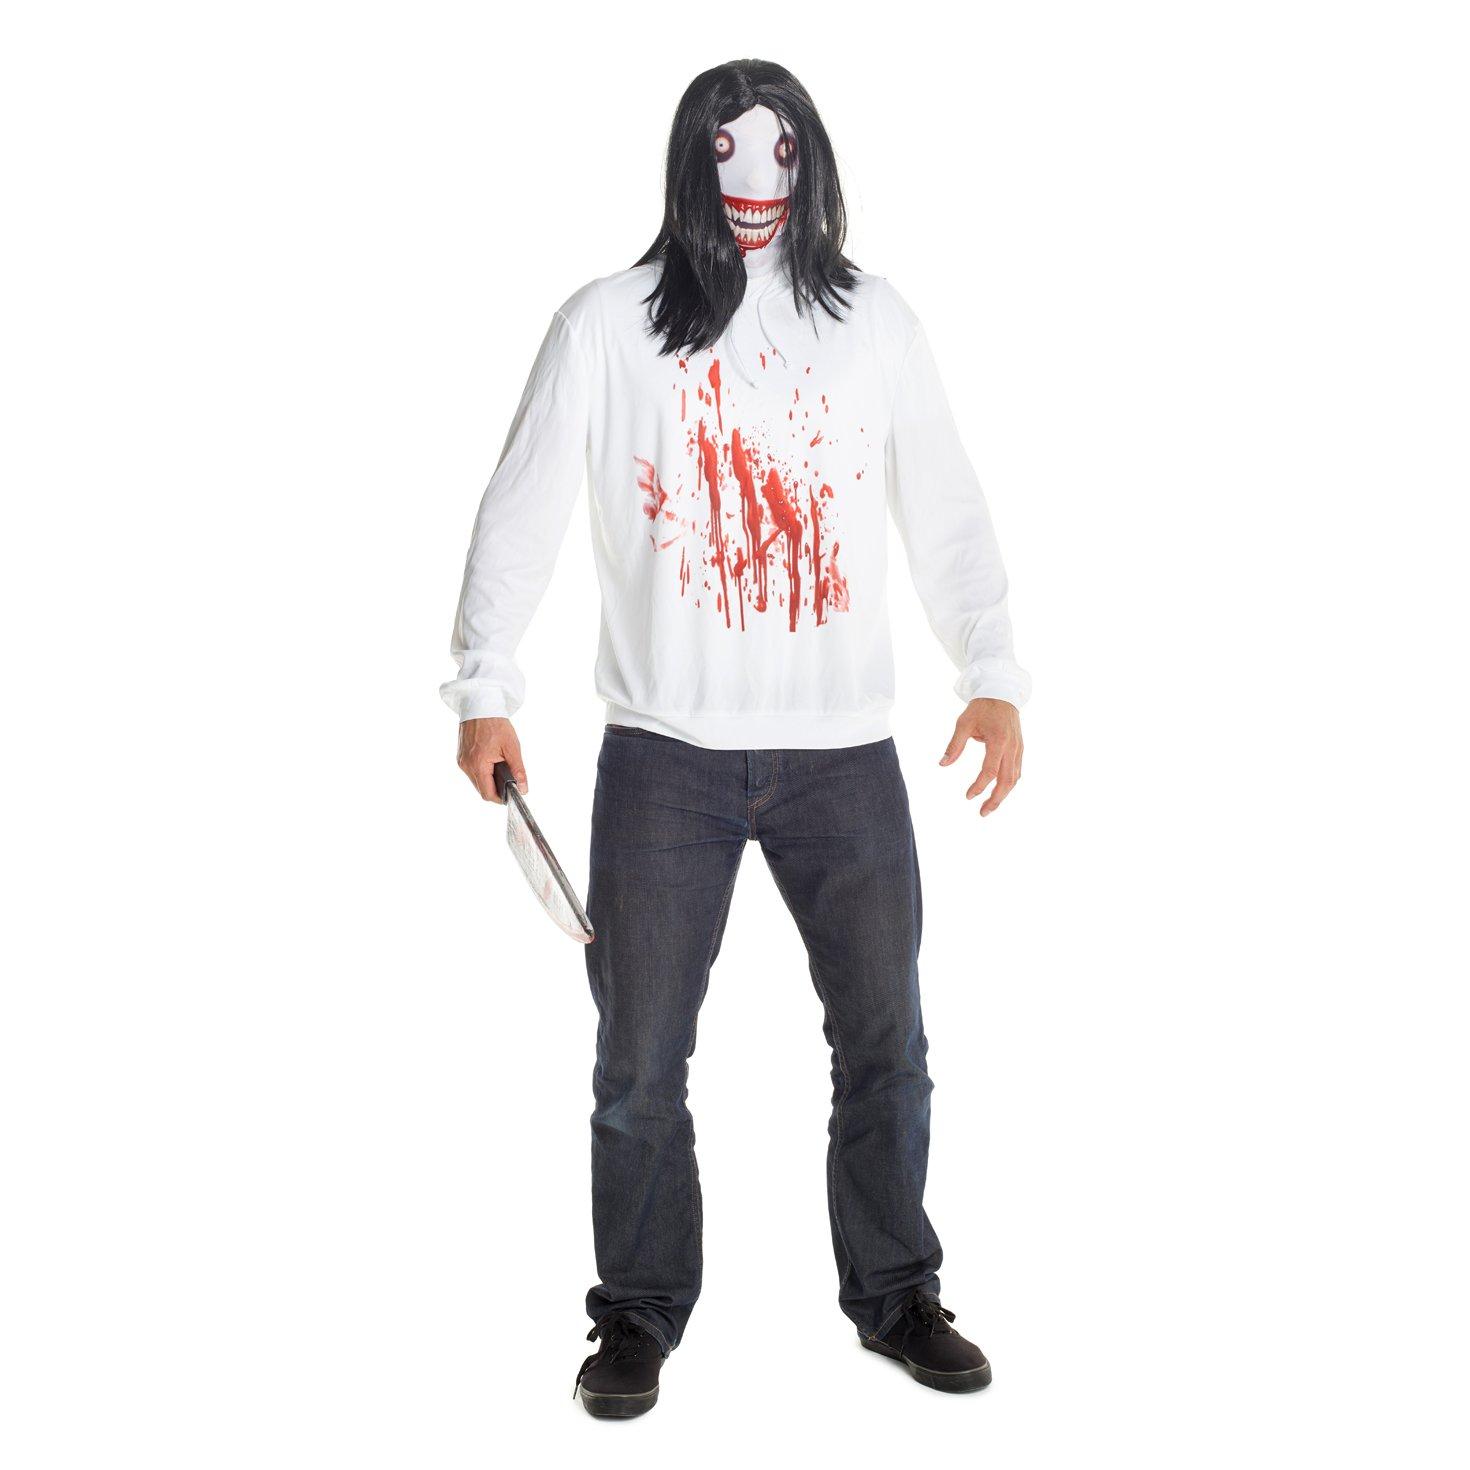 Jeff la Killer morphcostume disfraz - Talla única: Amazon.es ...